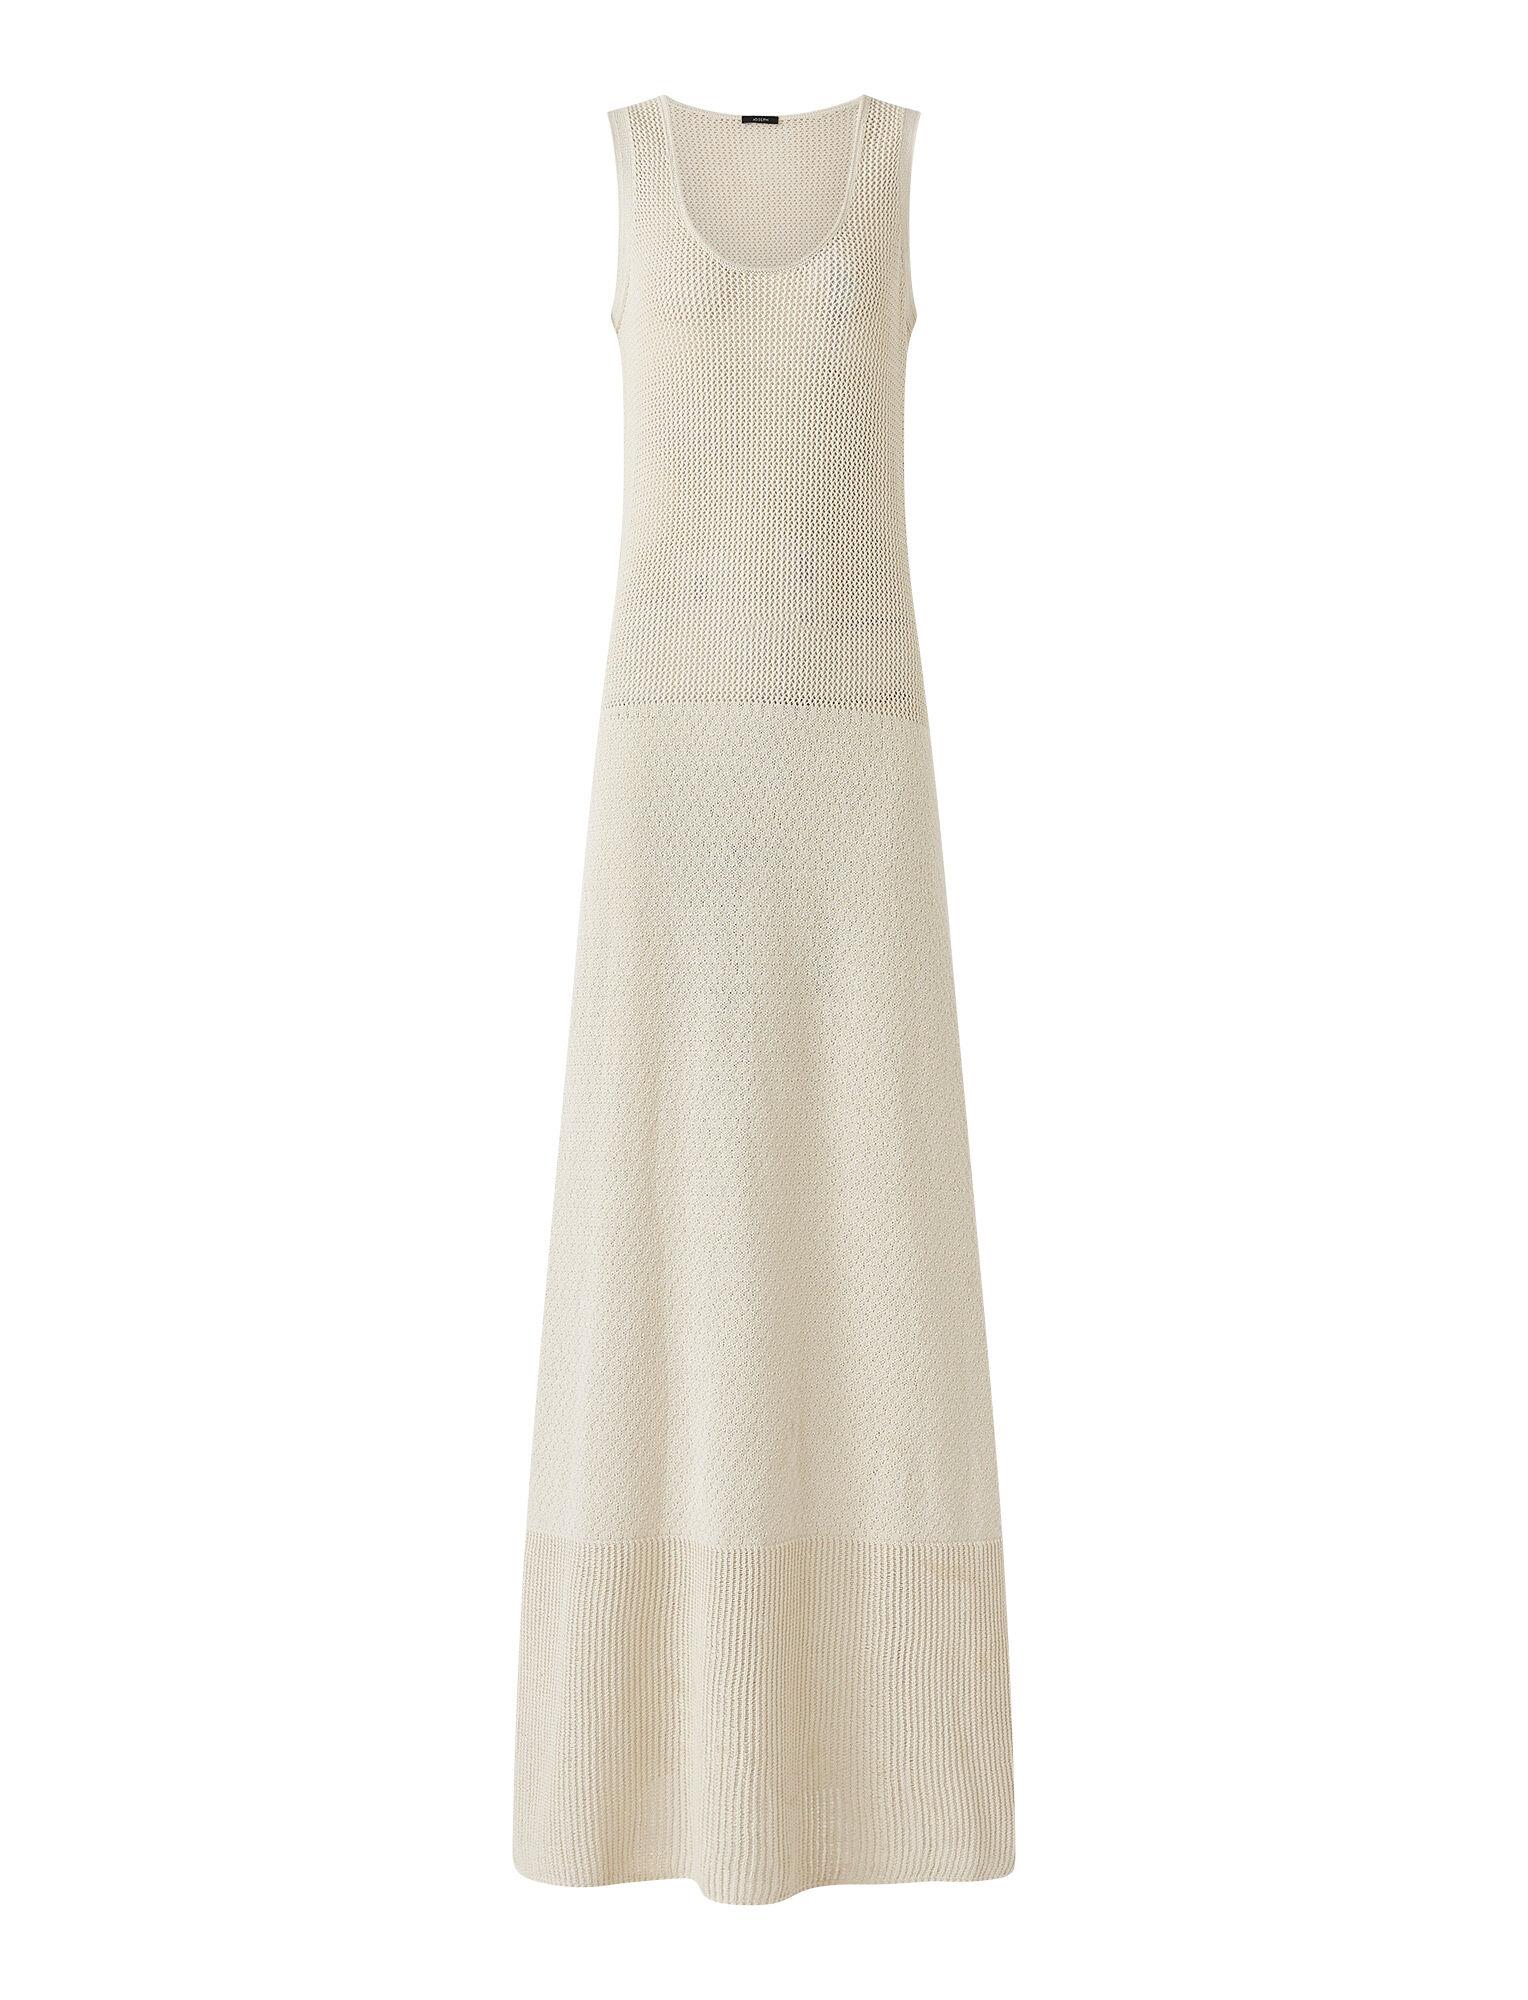 Joseph, Crispy Cotton Dress, in PORCELAIN